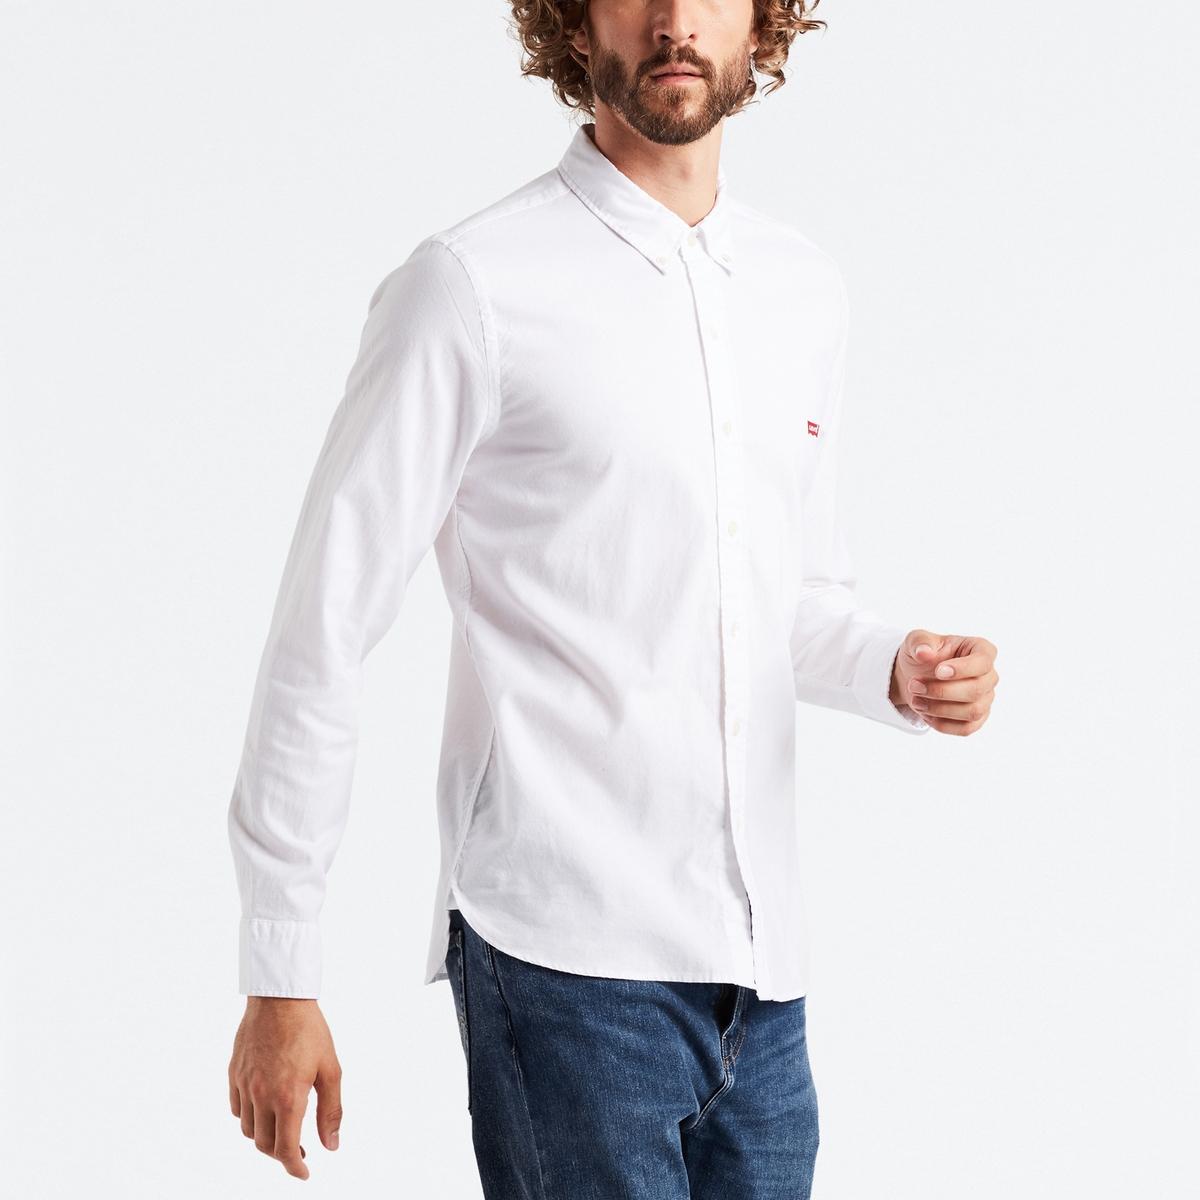 Camisa recta, manga larga, 100% algodón